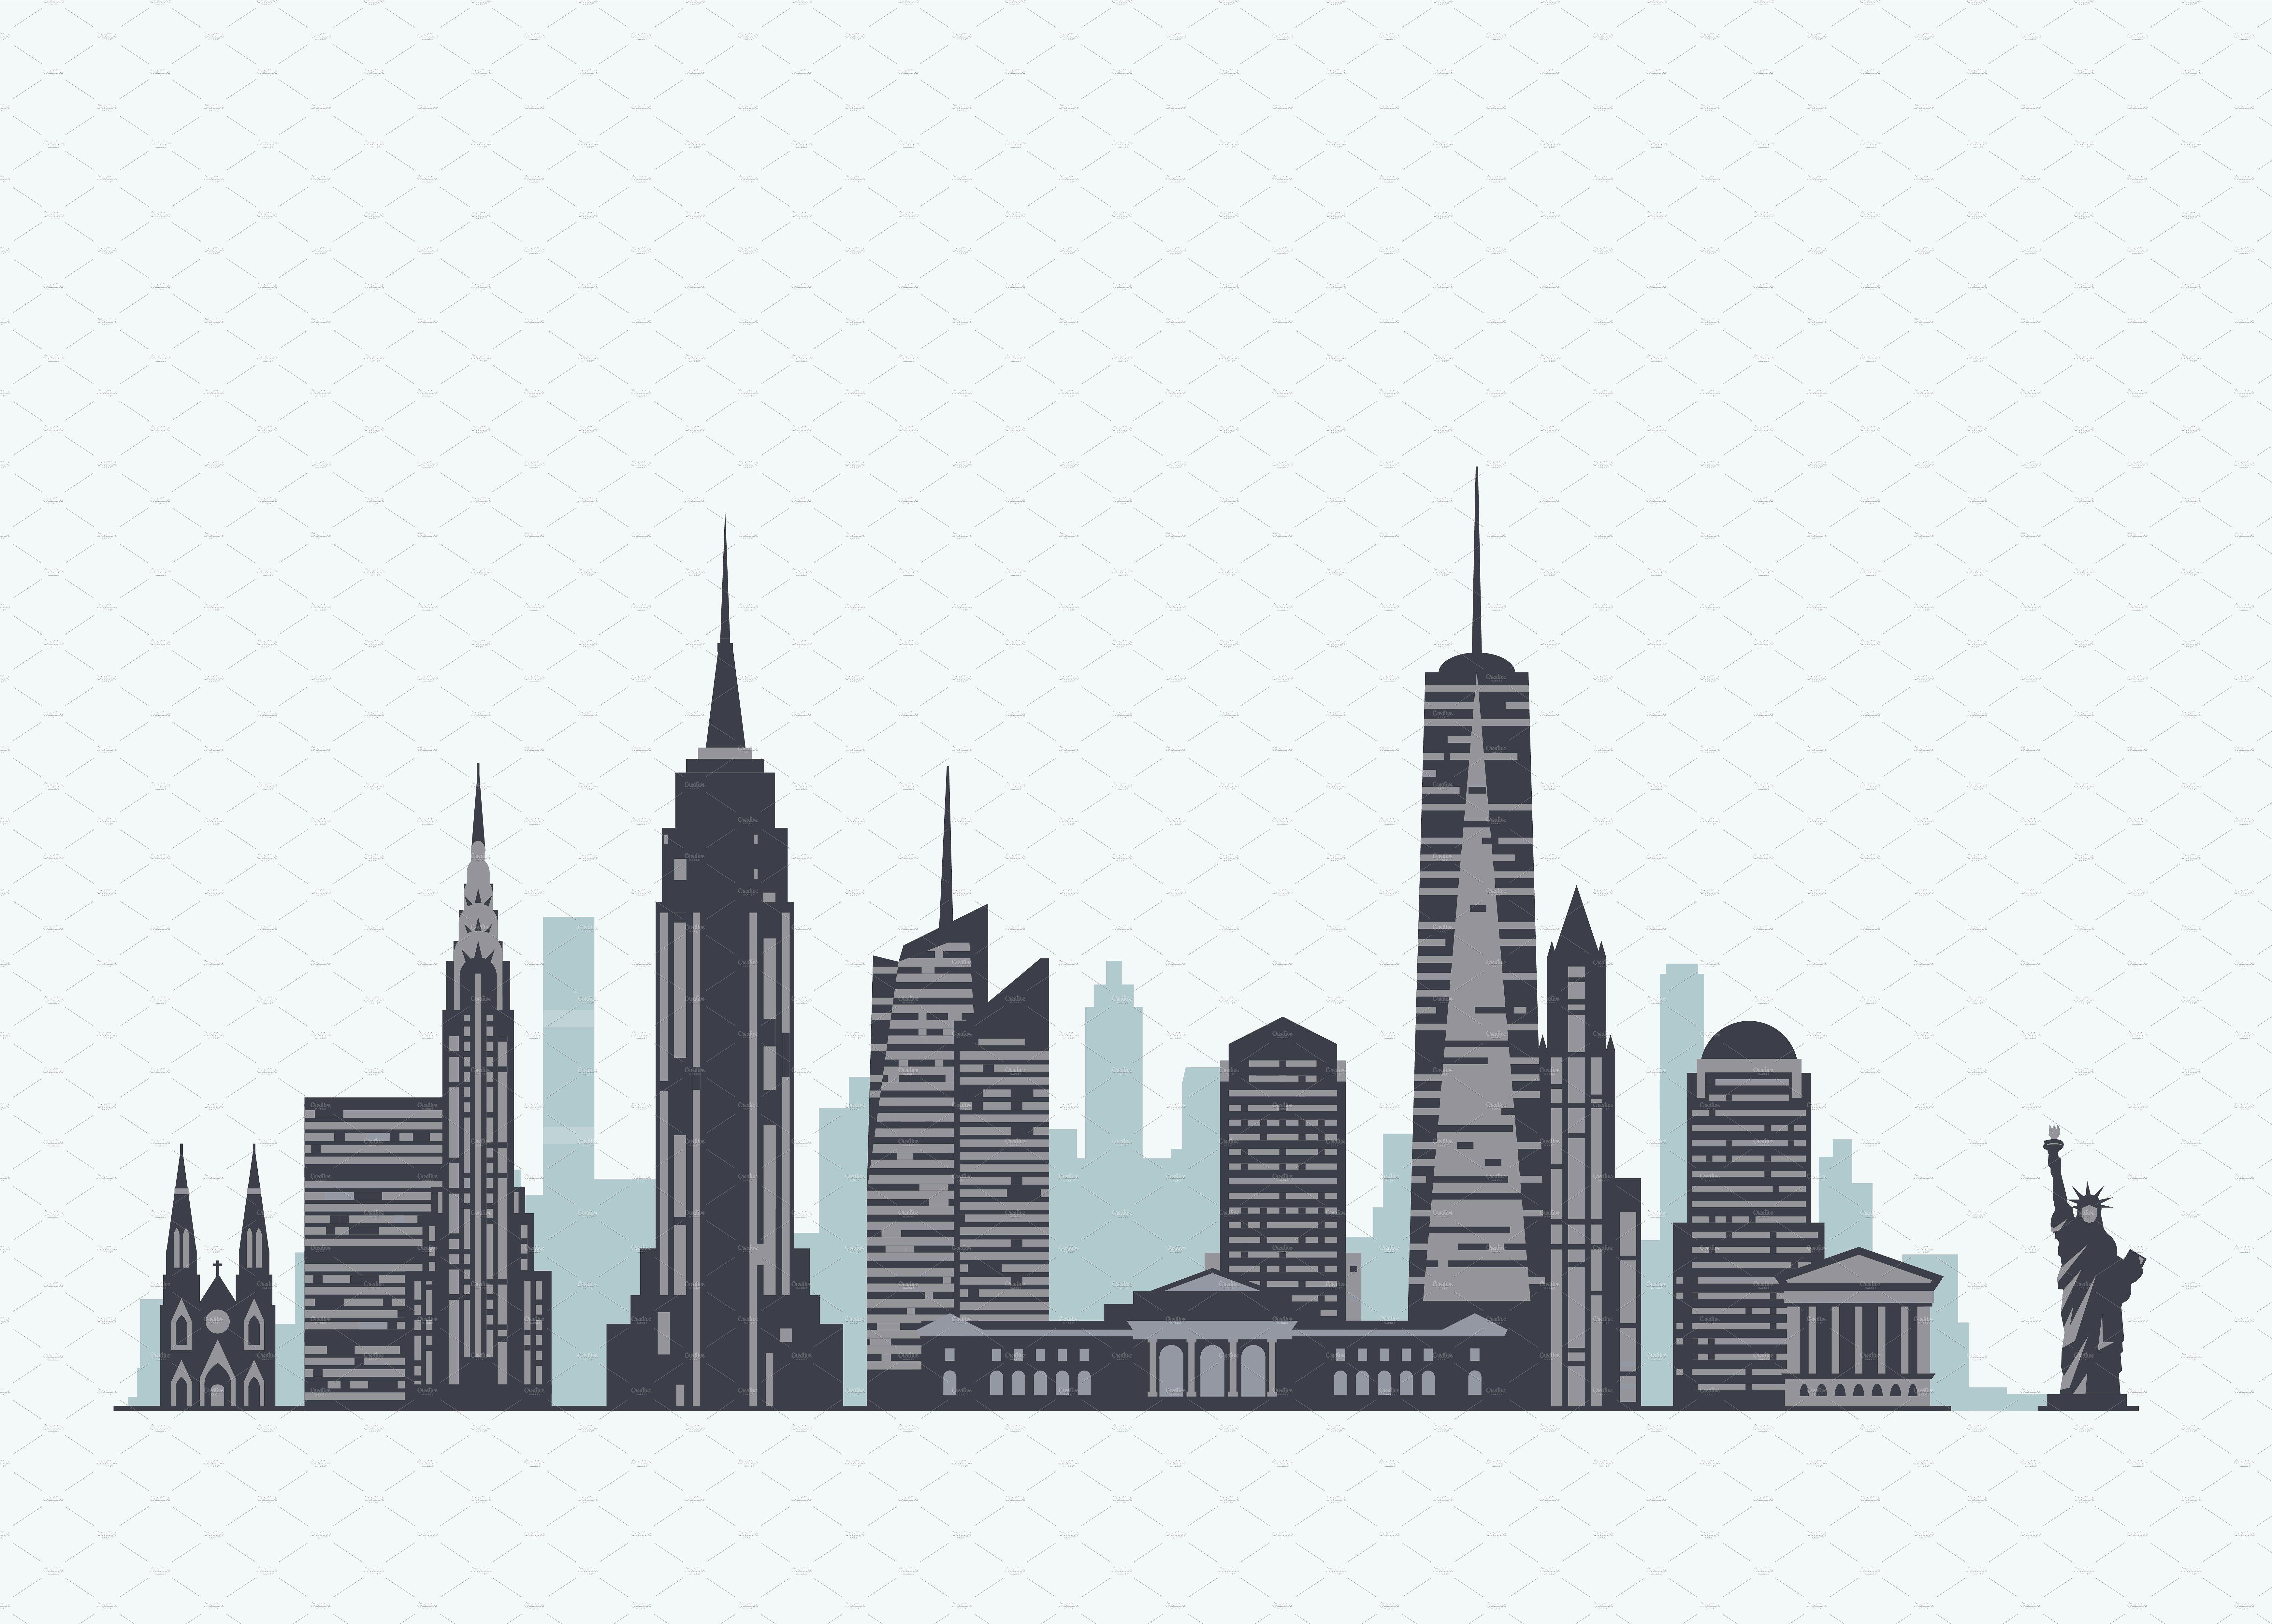 New York skyline | New york illustration, New york skyline ...